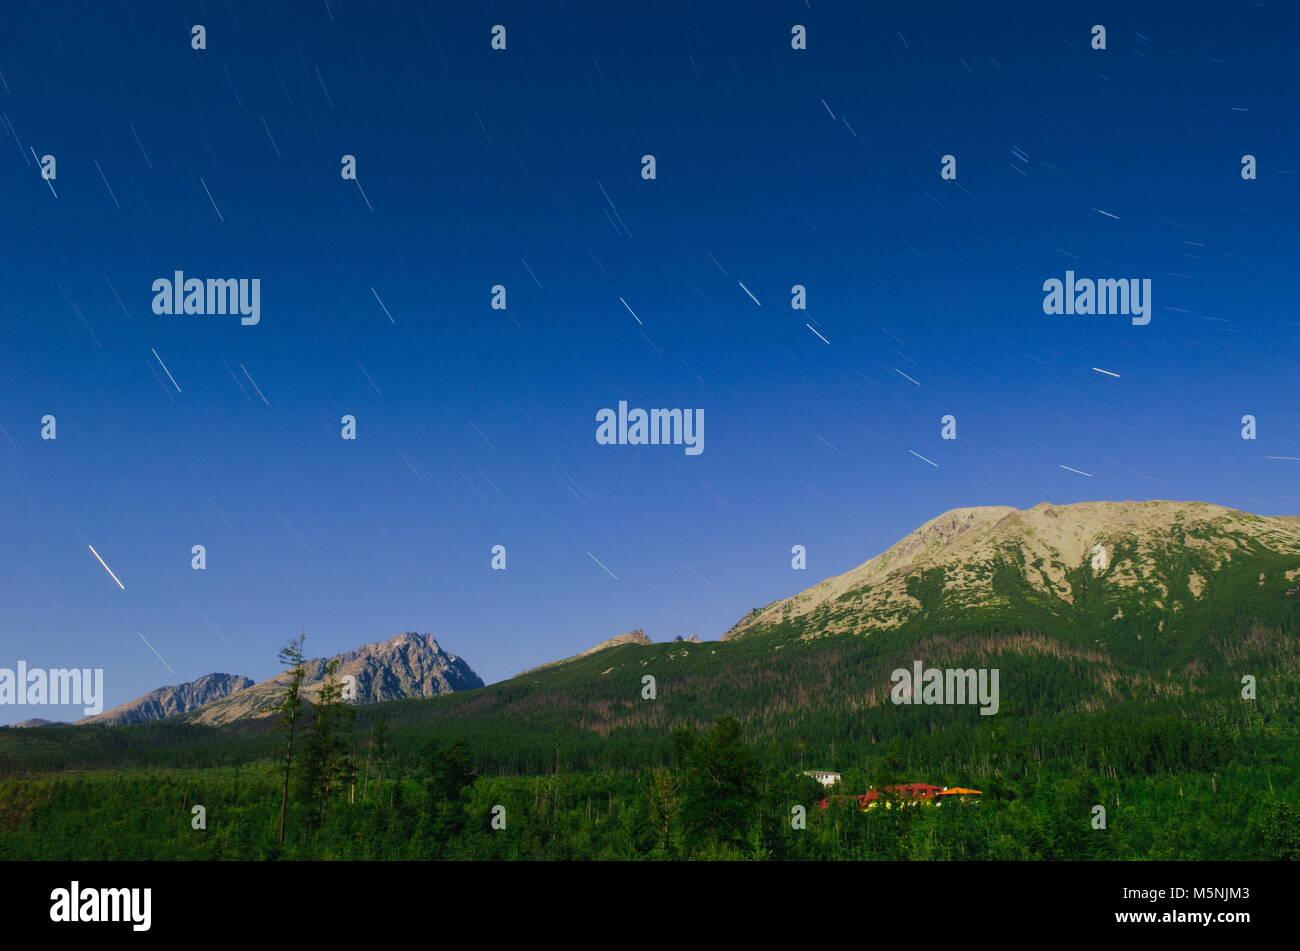 Big Dipper Asterism Ursa Major Constellation Astrophotography over Slavkovsky Stit Mountain Peak in High Tatras - Stock Image